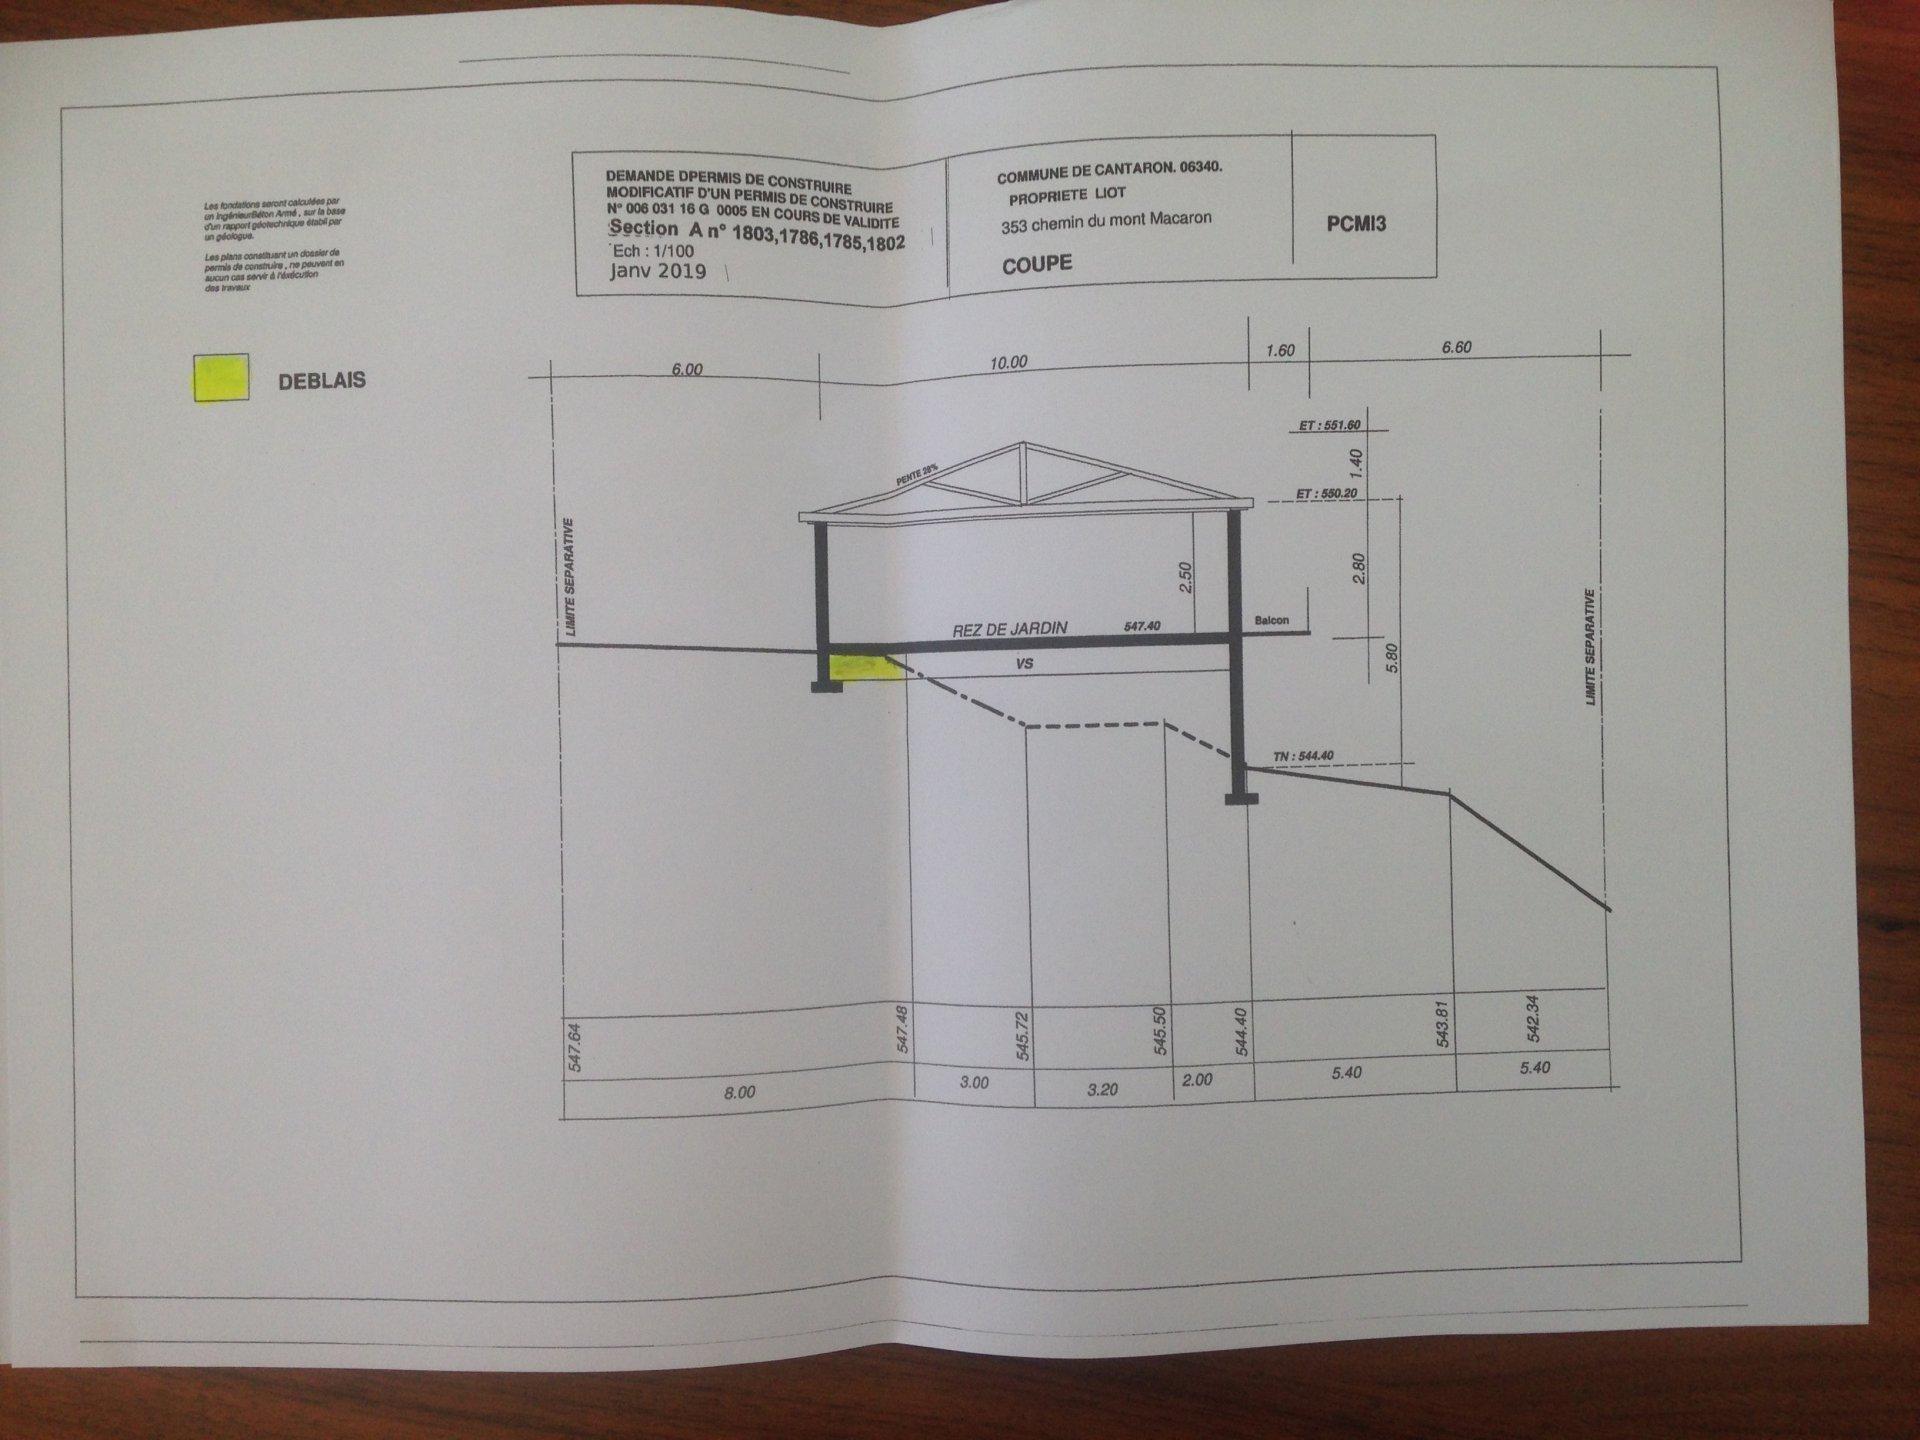 06 - L'ABADIE - TERRAIN CONSTRUCTIBLE 1500 M2